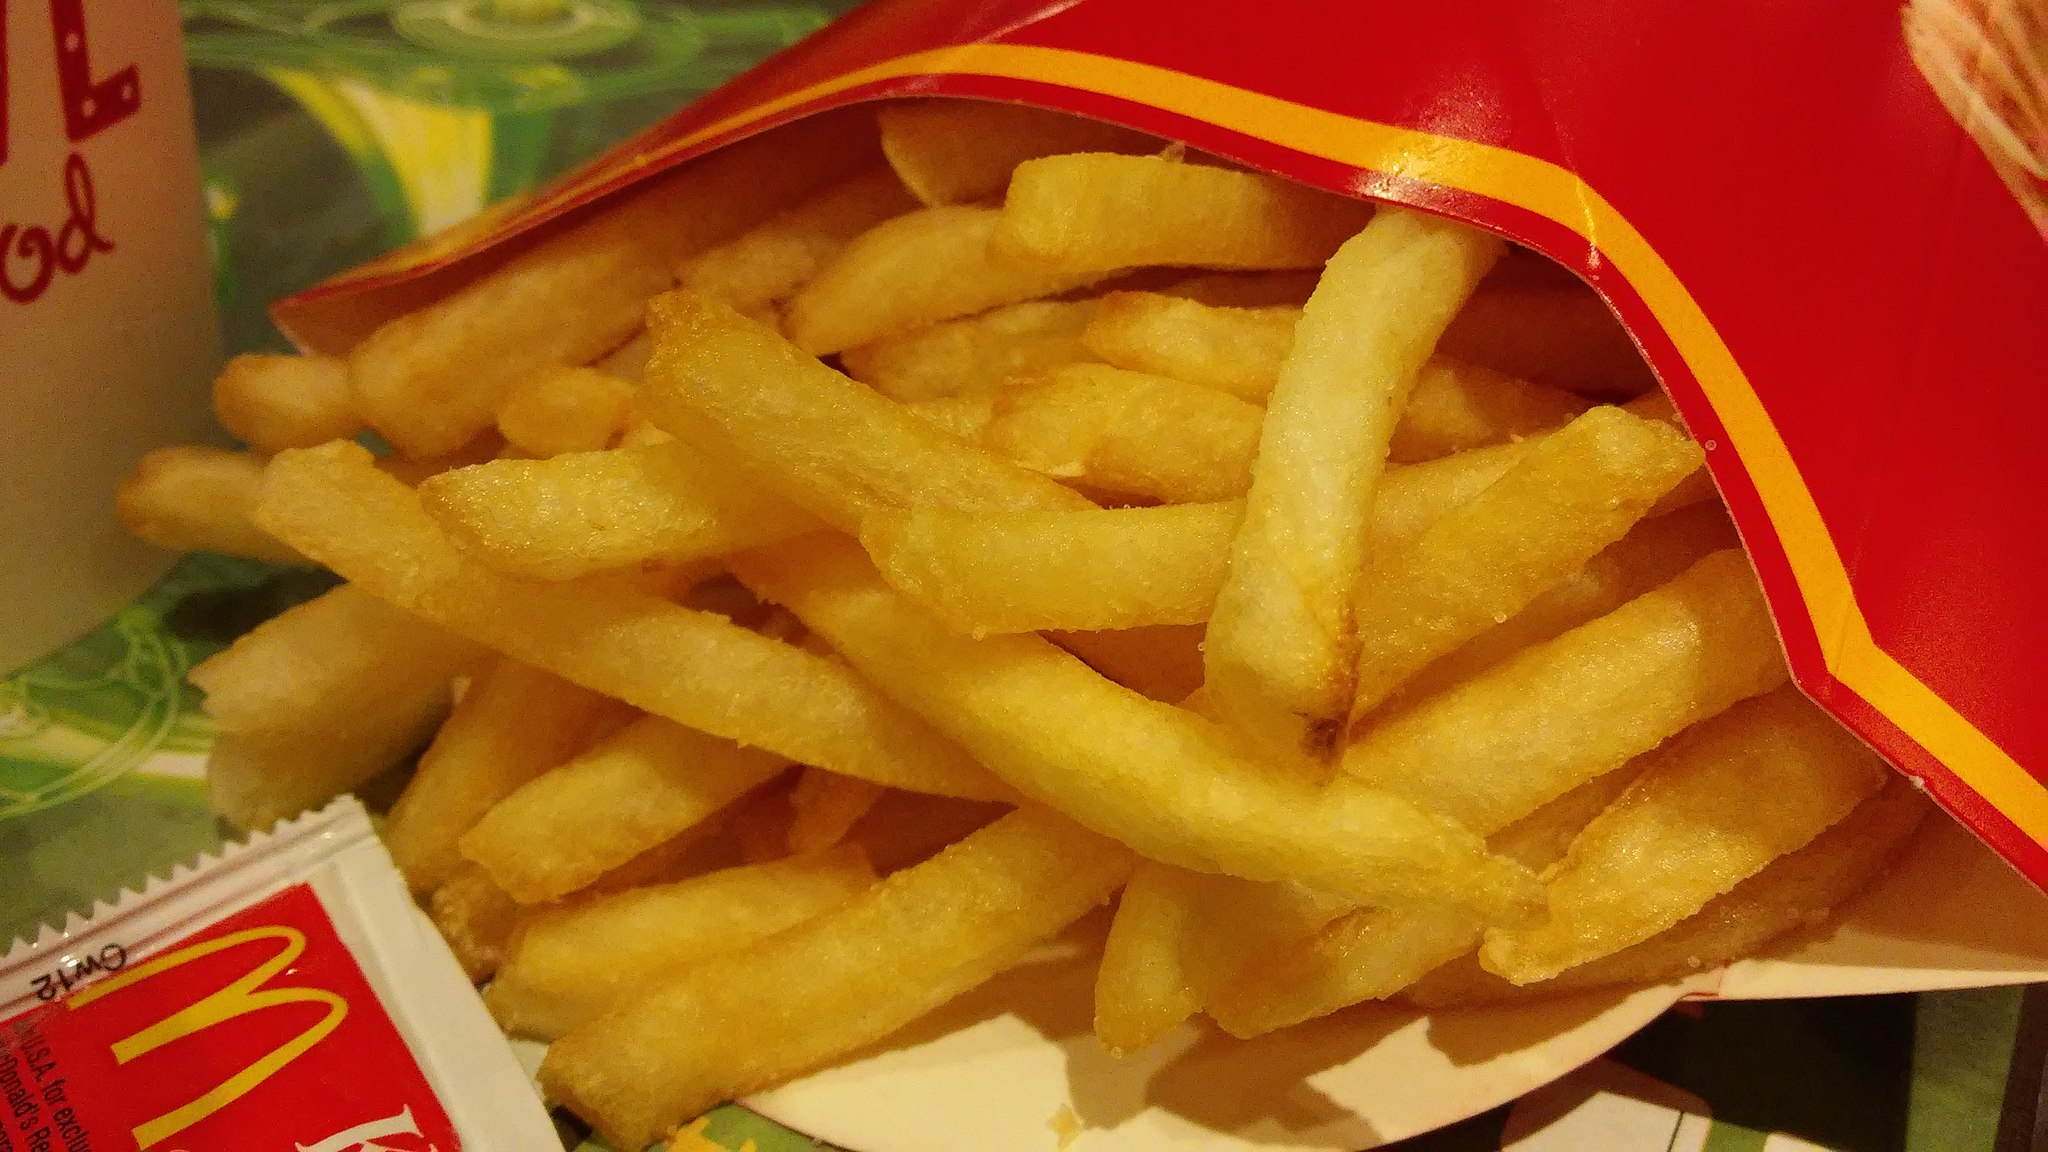 fresh McDonald's french fries